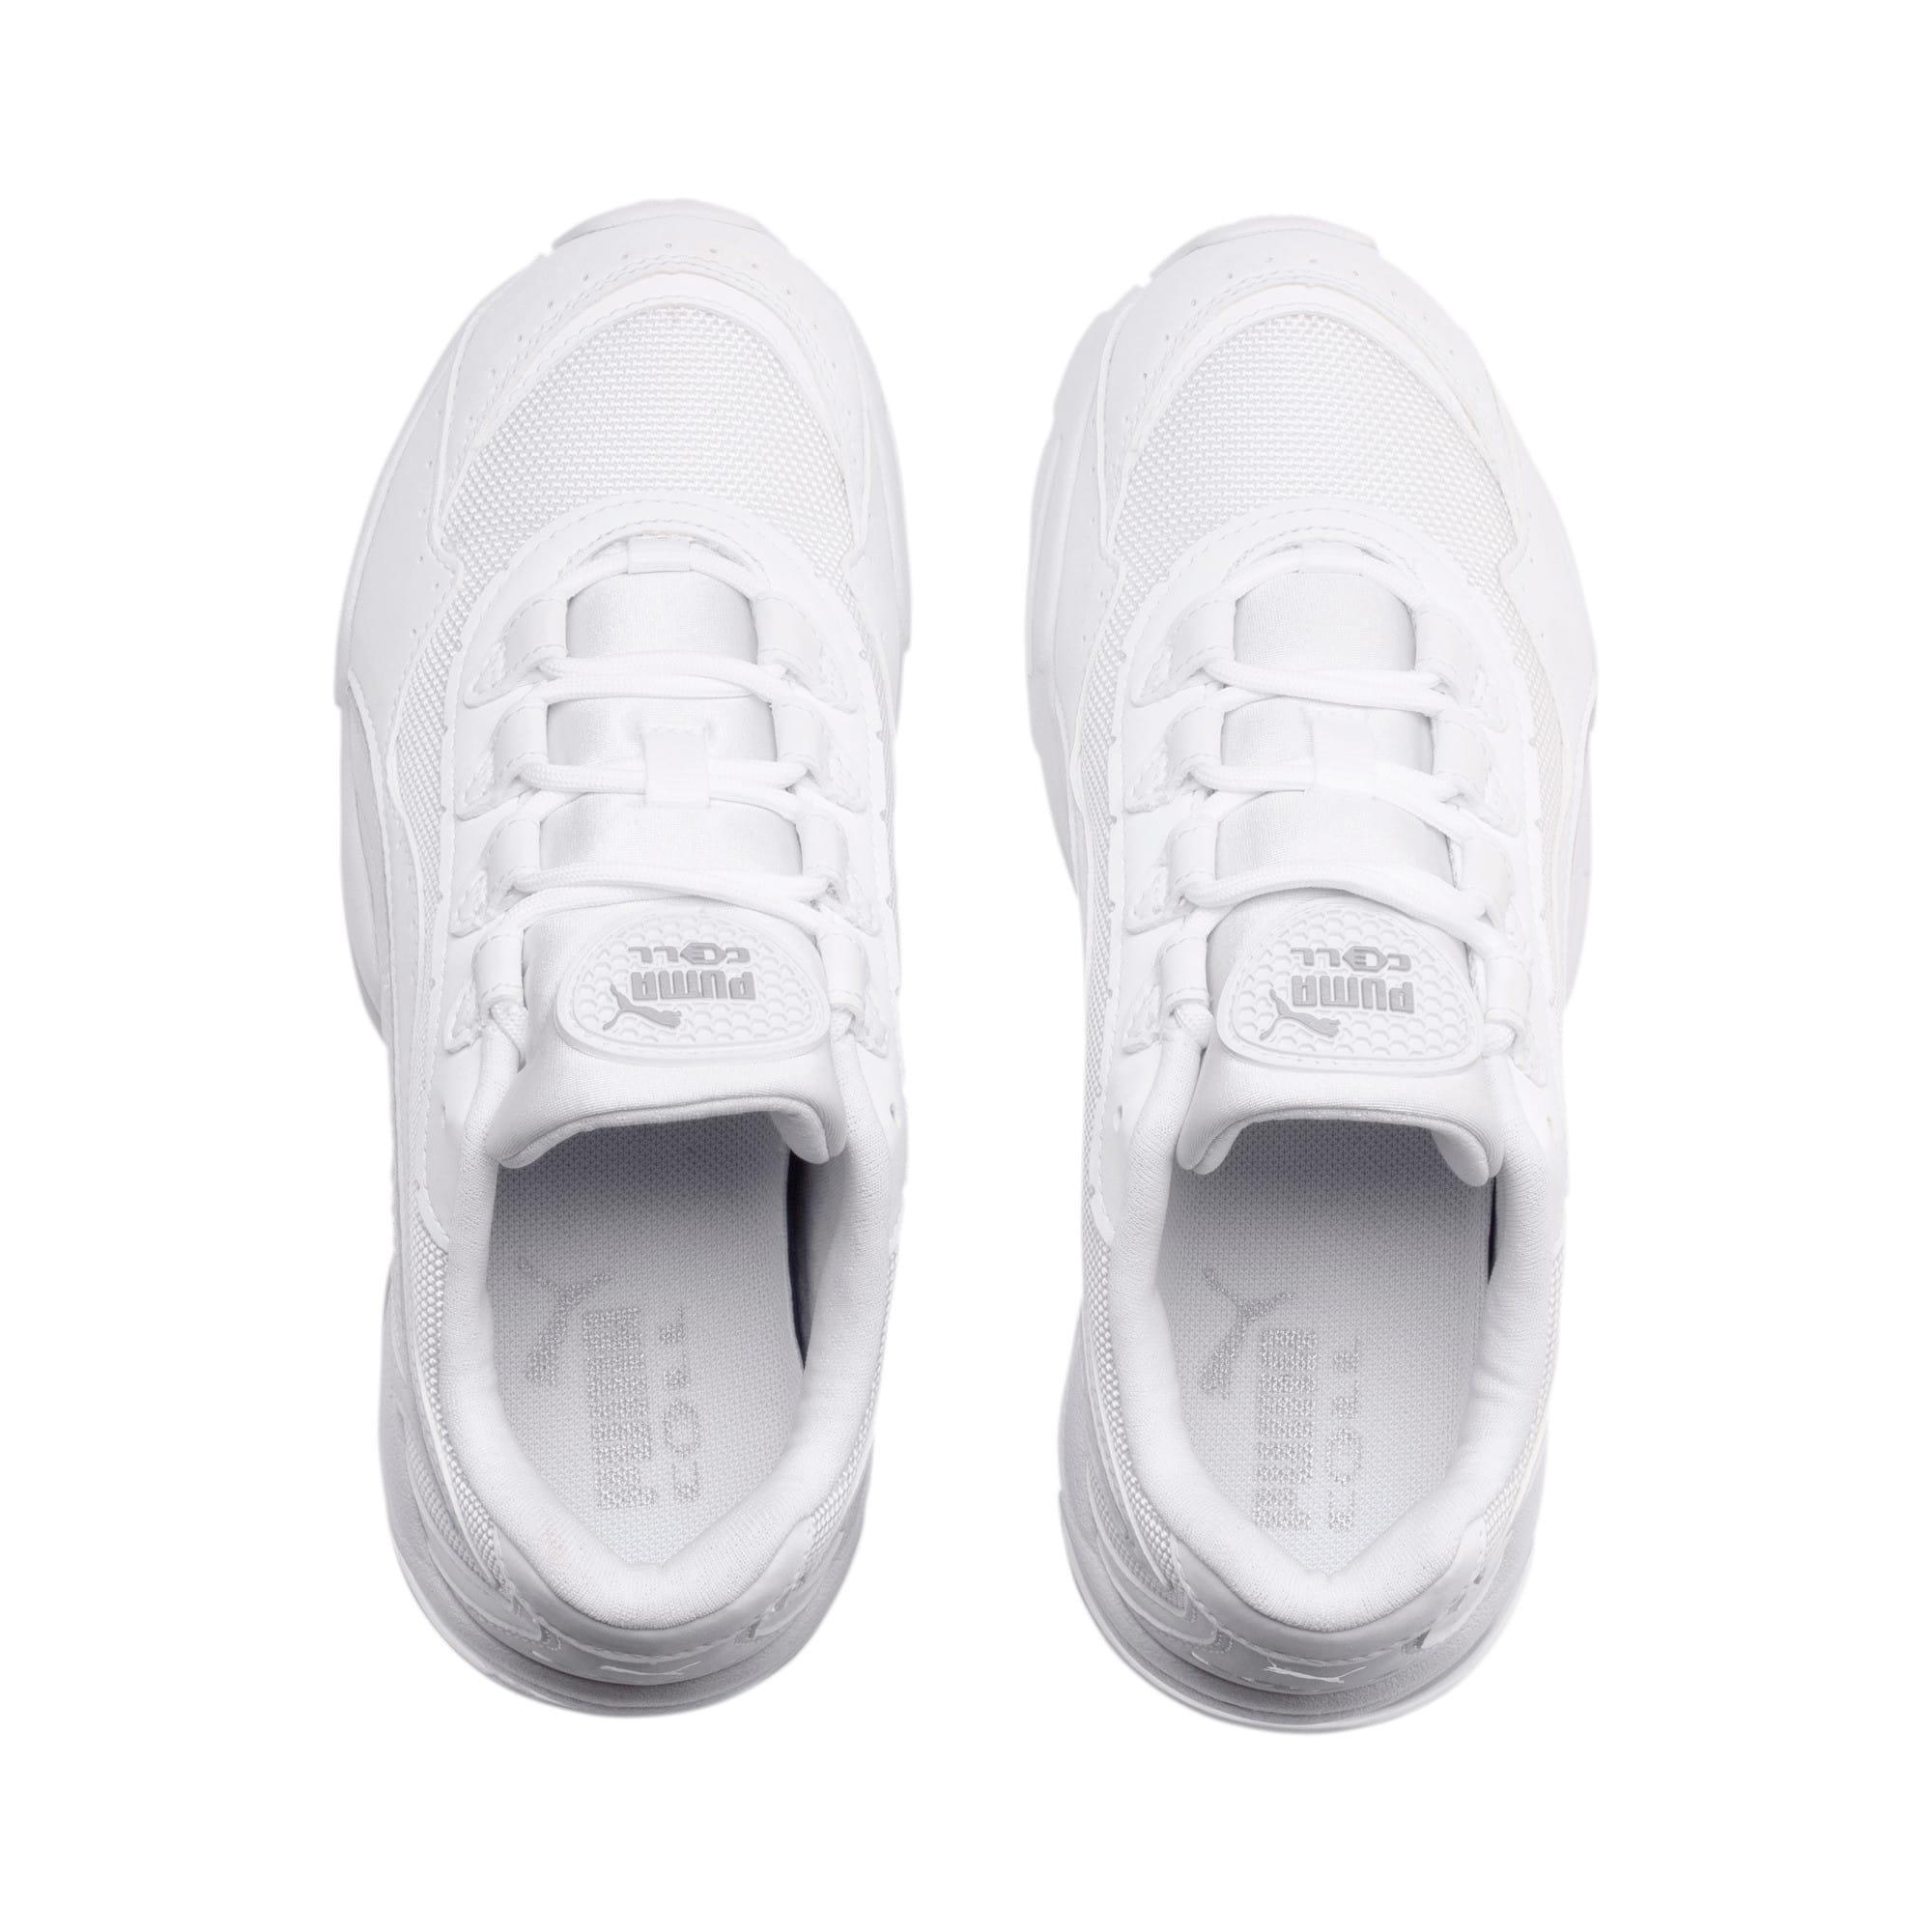 Thumbnail 6 of CELL Stellar Damen Sneaker, Puma White-Silver, medium